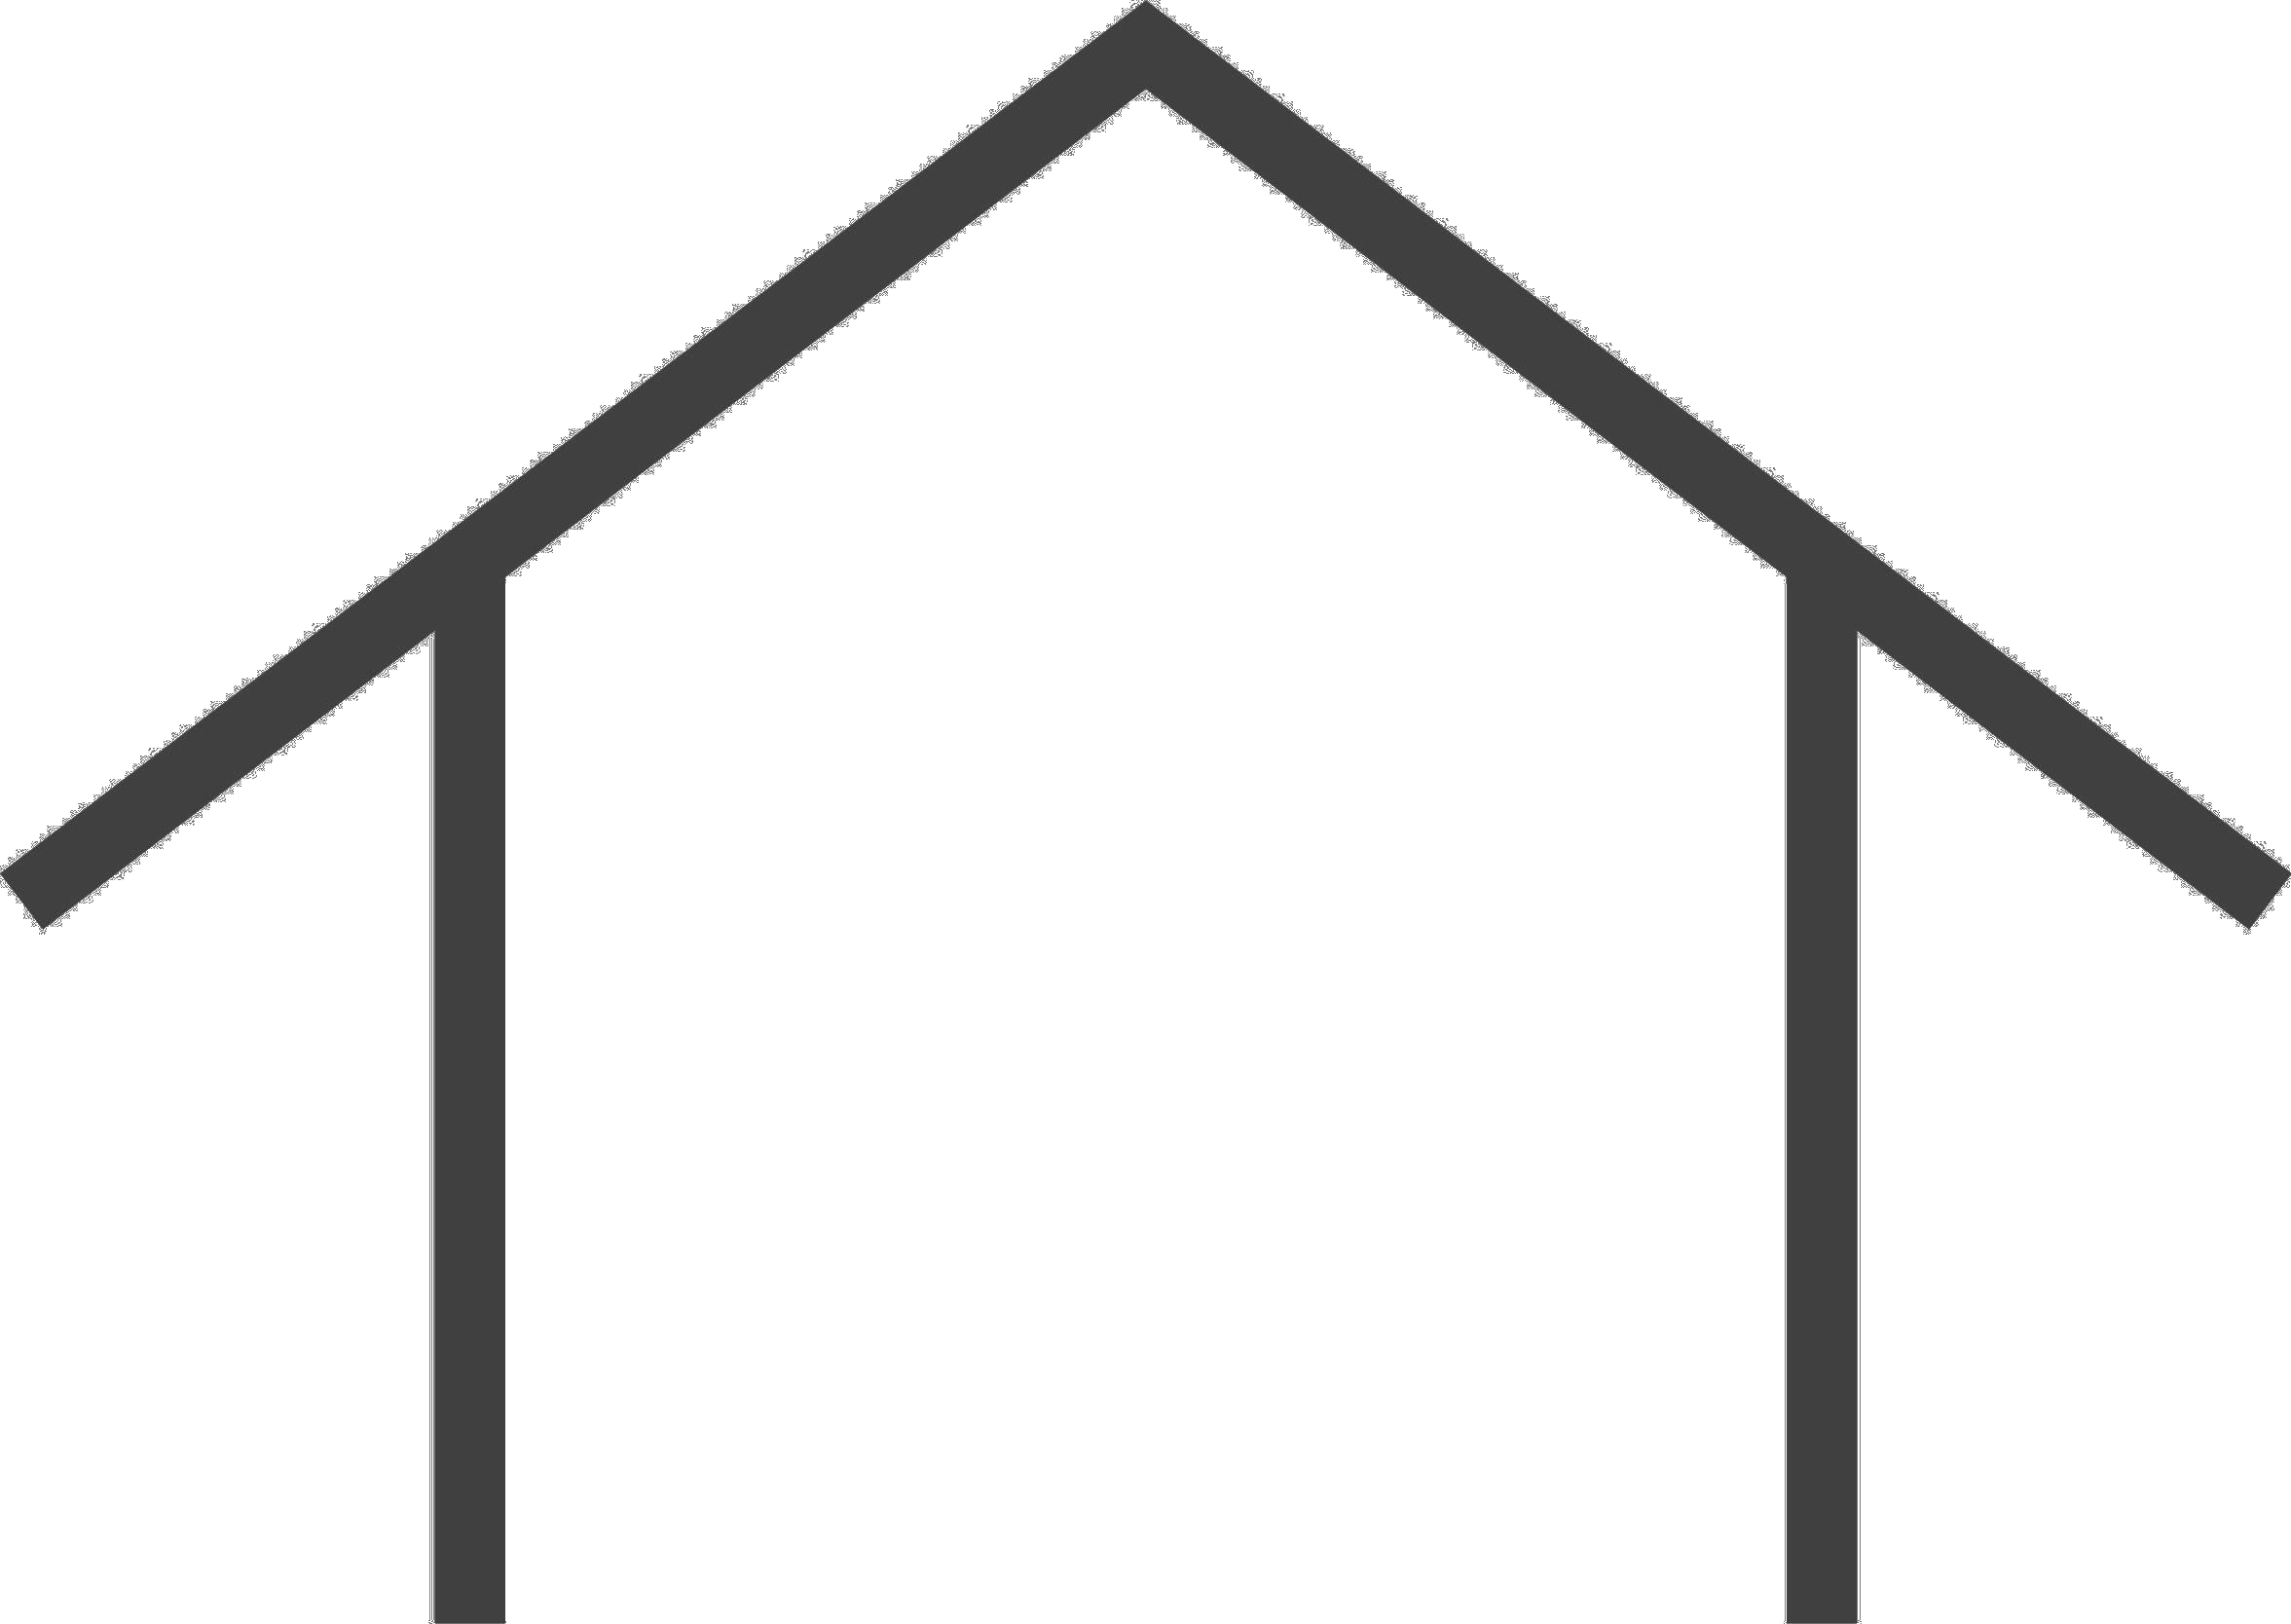 घर बचाओ घर बनाओ आंदोलन